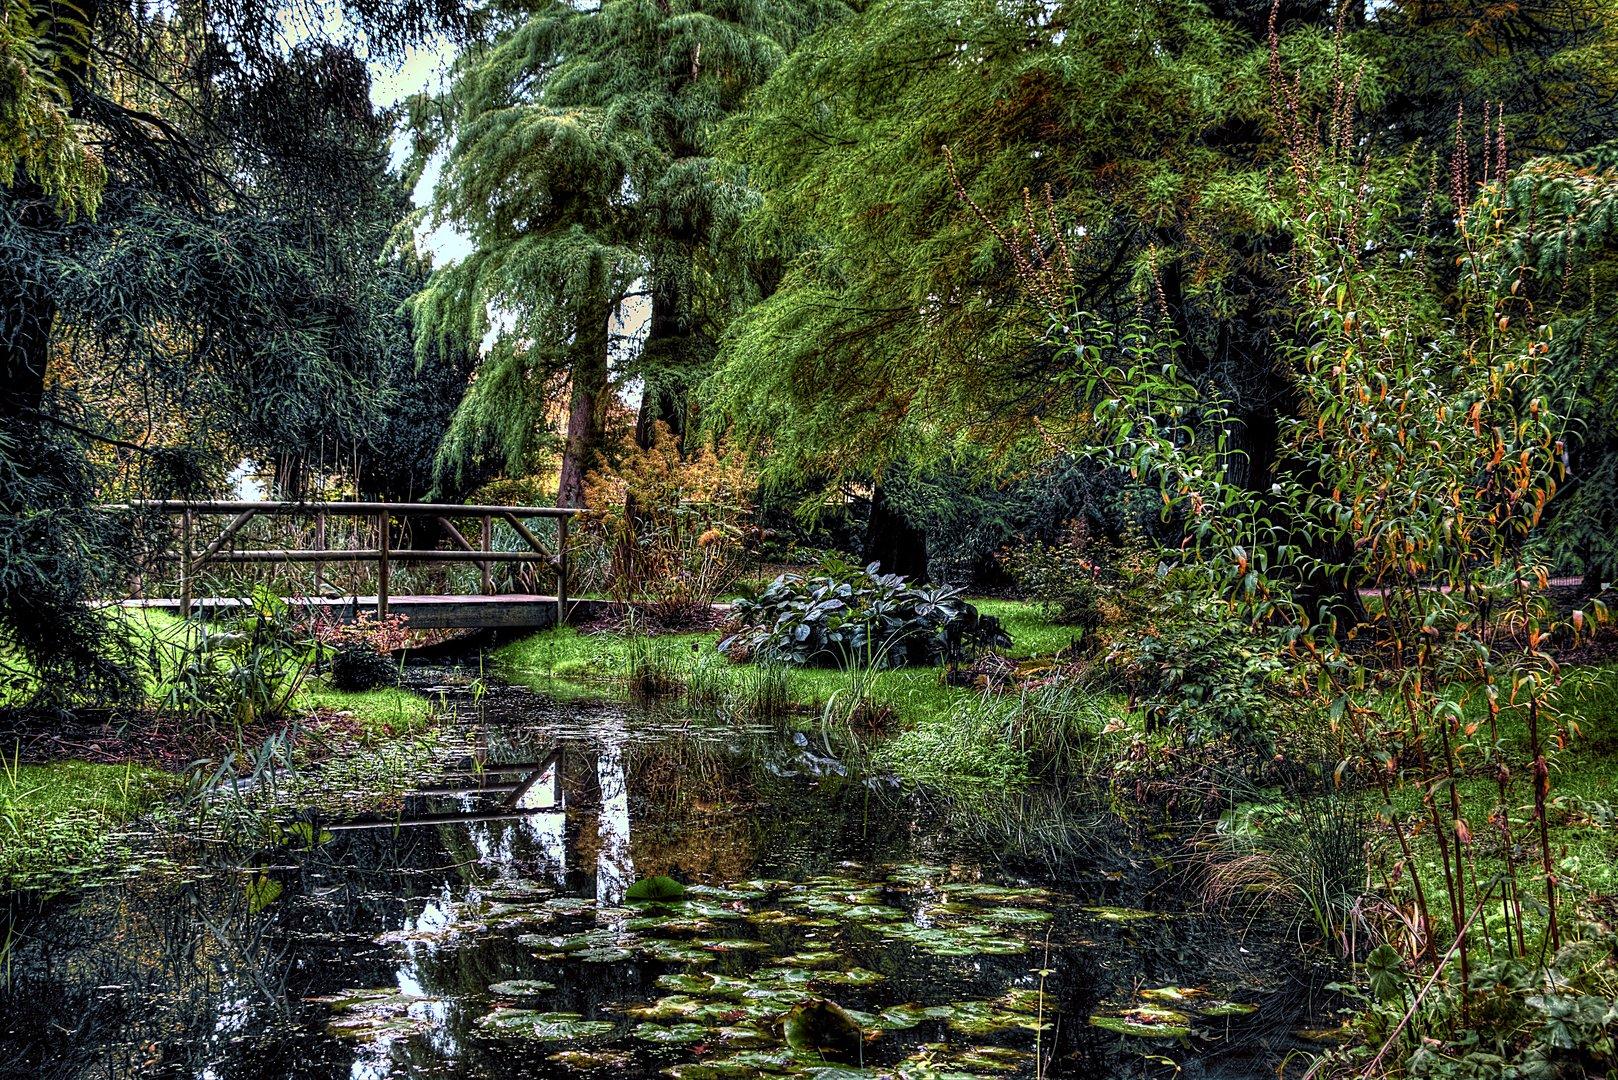 Alter Botanischer Garten Kiel: Alter Botanischer Garten In Kiel No1 Foto & Bild